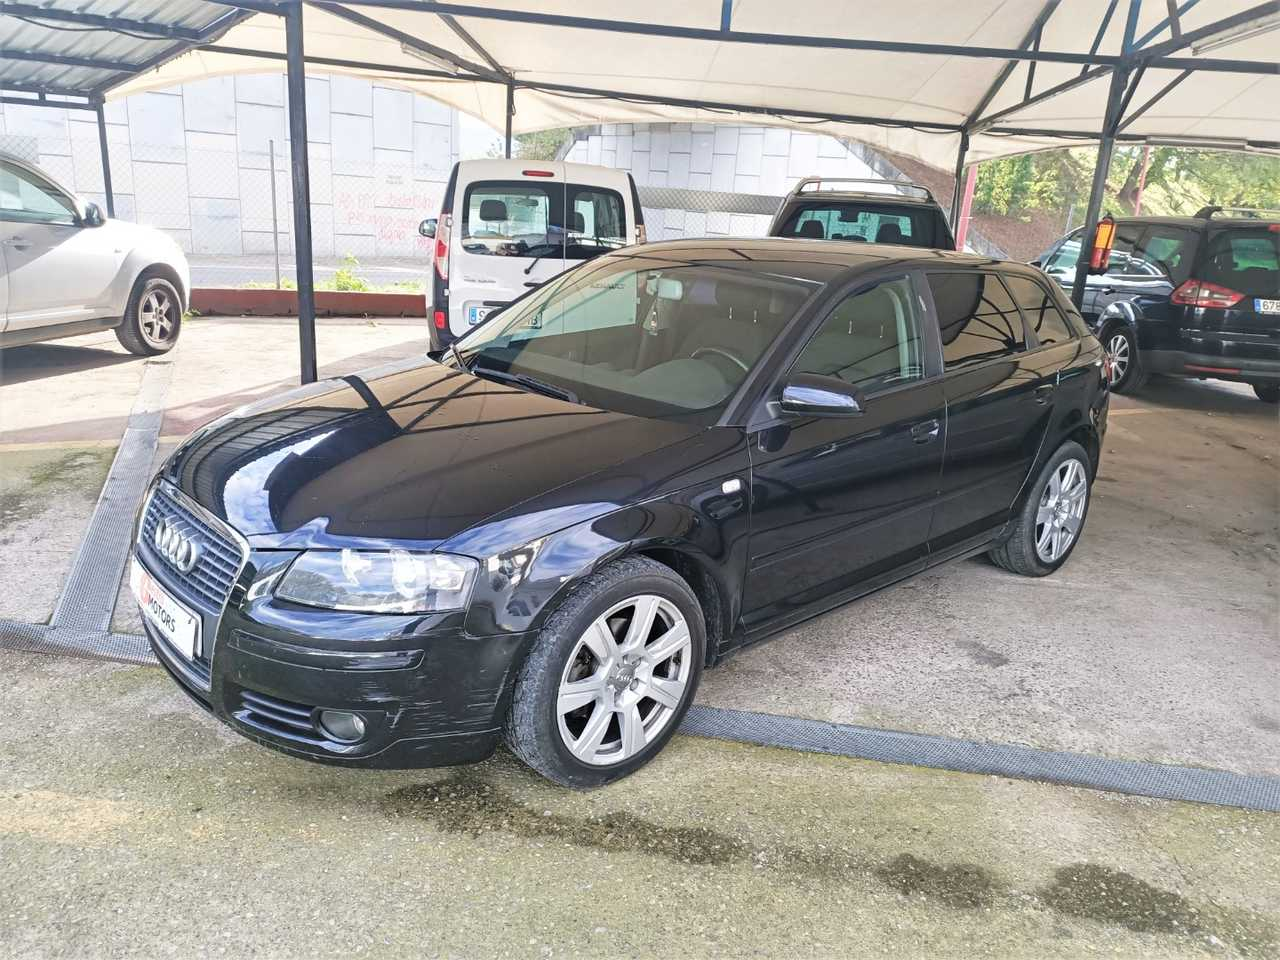 Audi A3 Sportback 2.0 TDI   - Foto 1